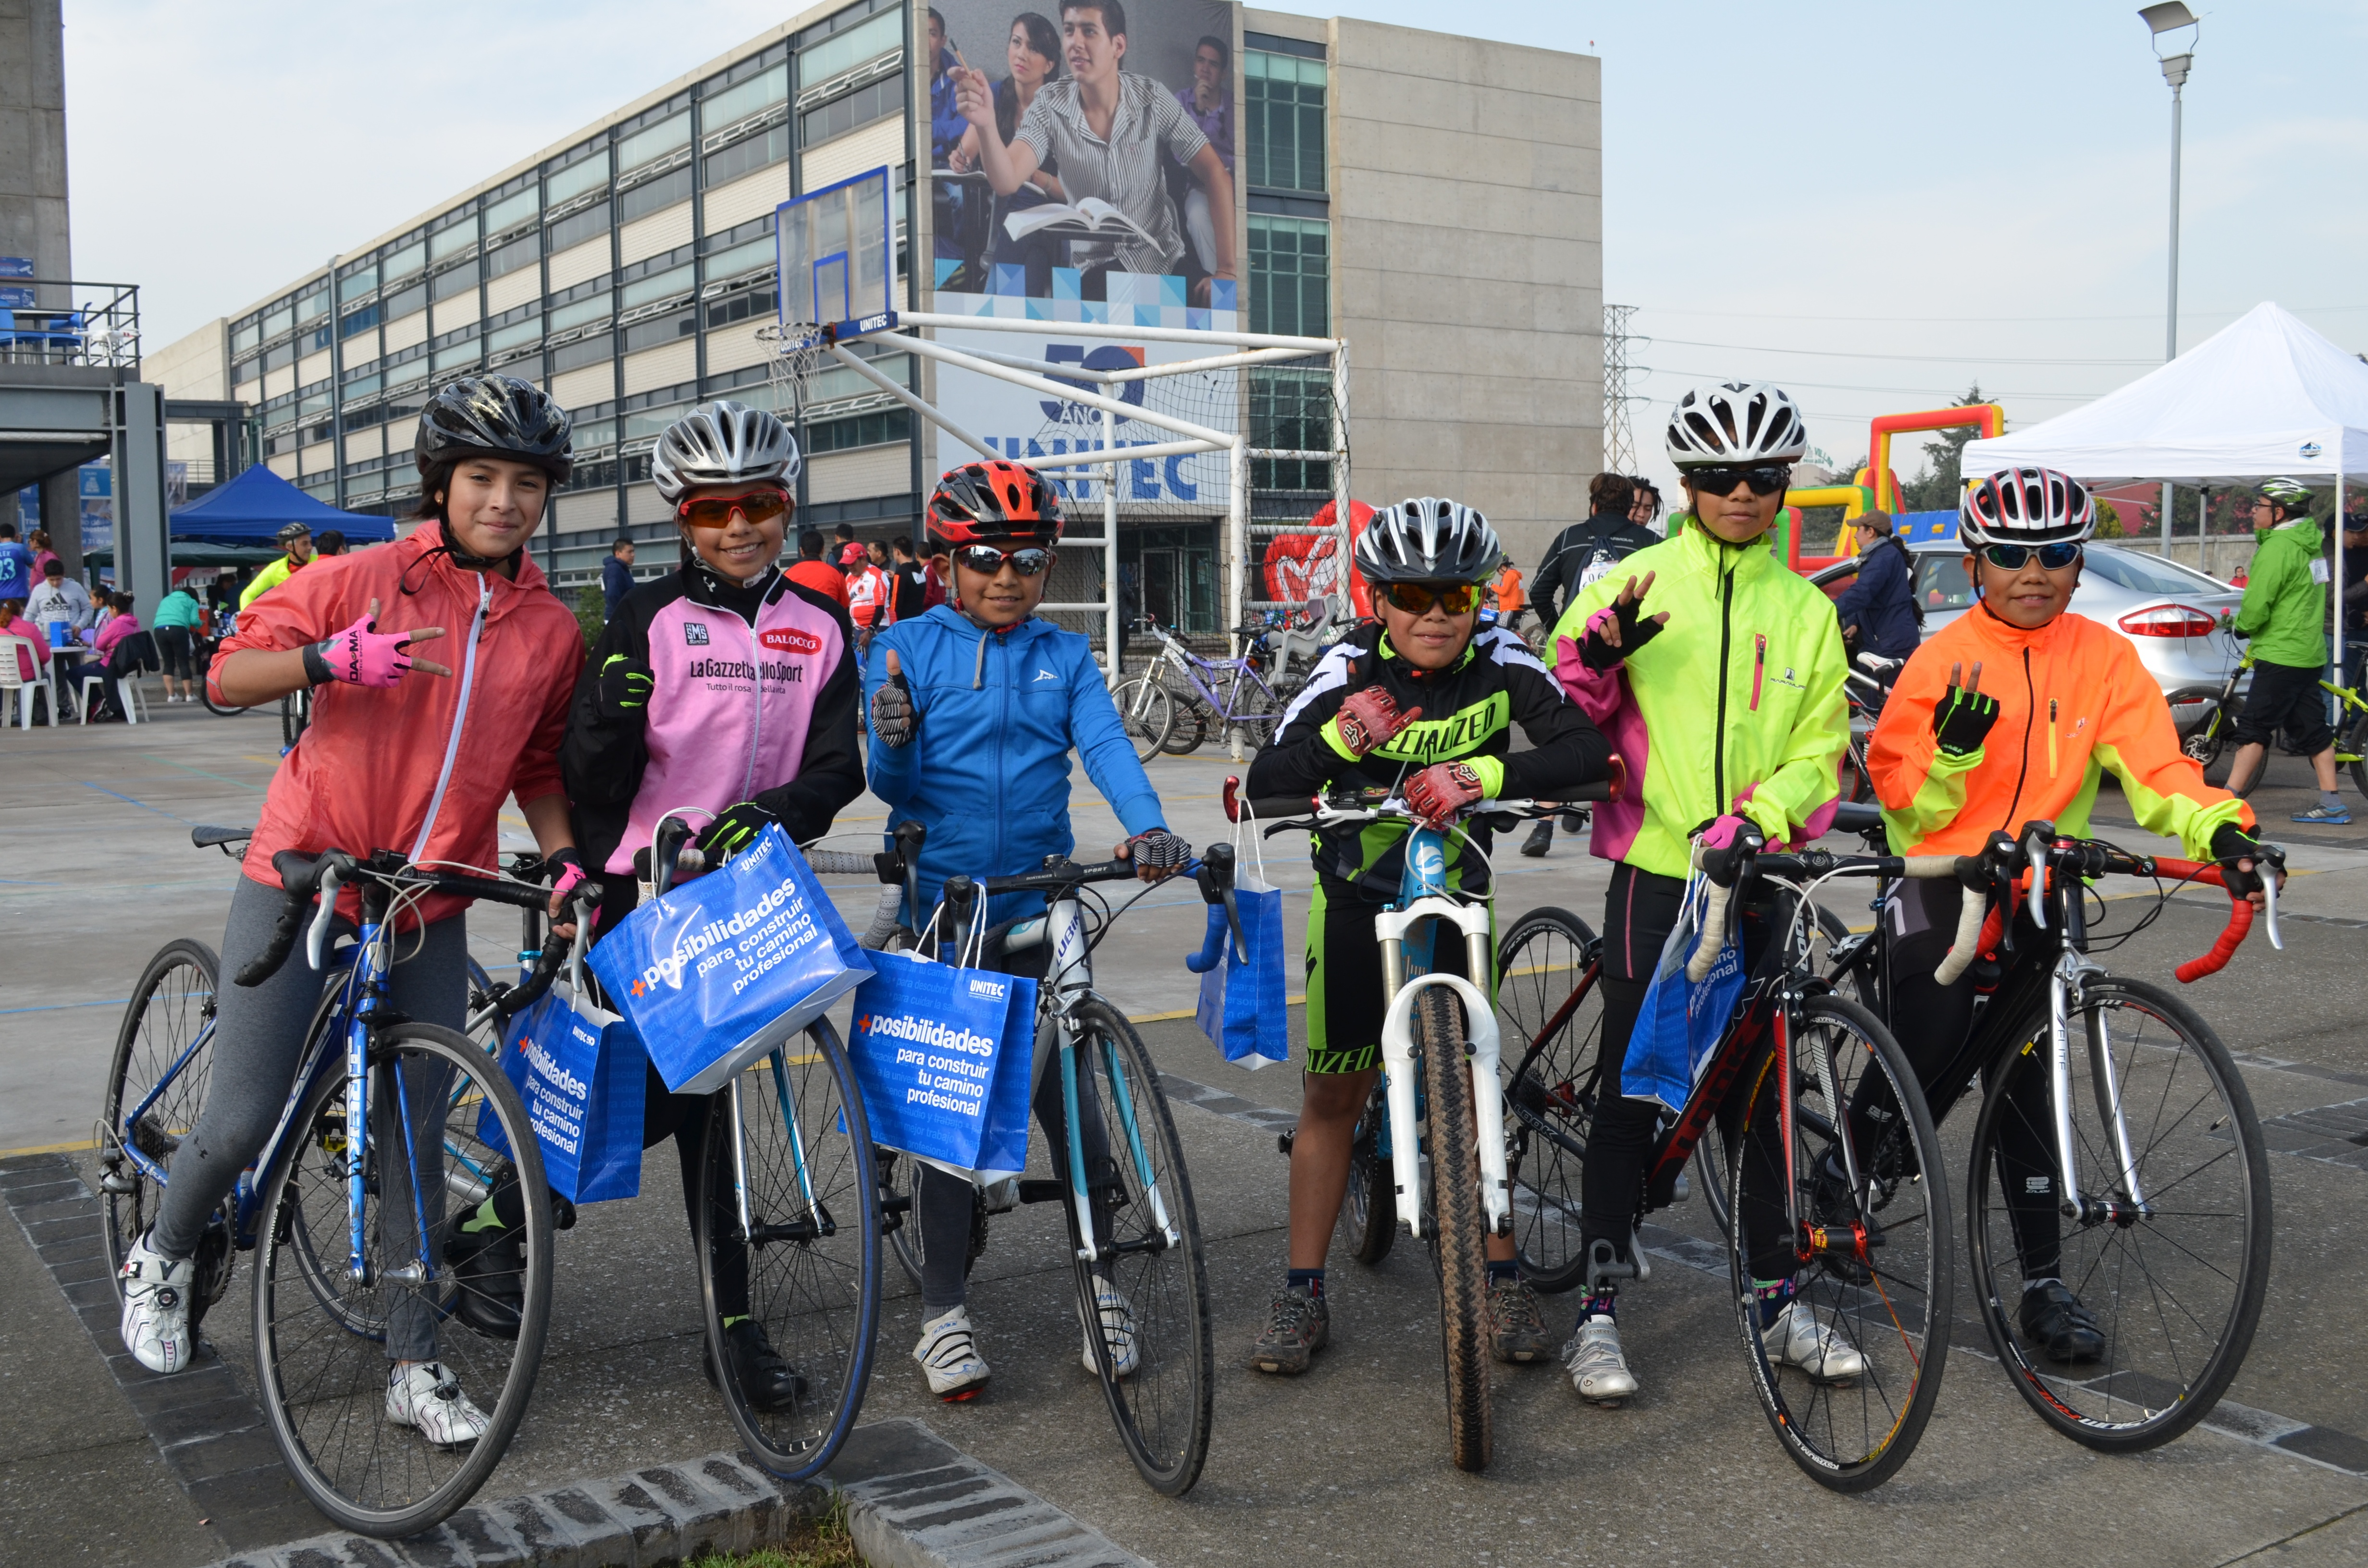 UNITEC Campus Toluca realiza su 3er Paseo Ciclista con éxito